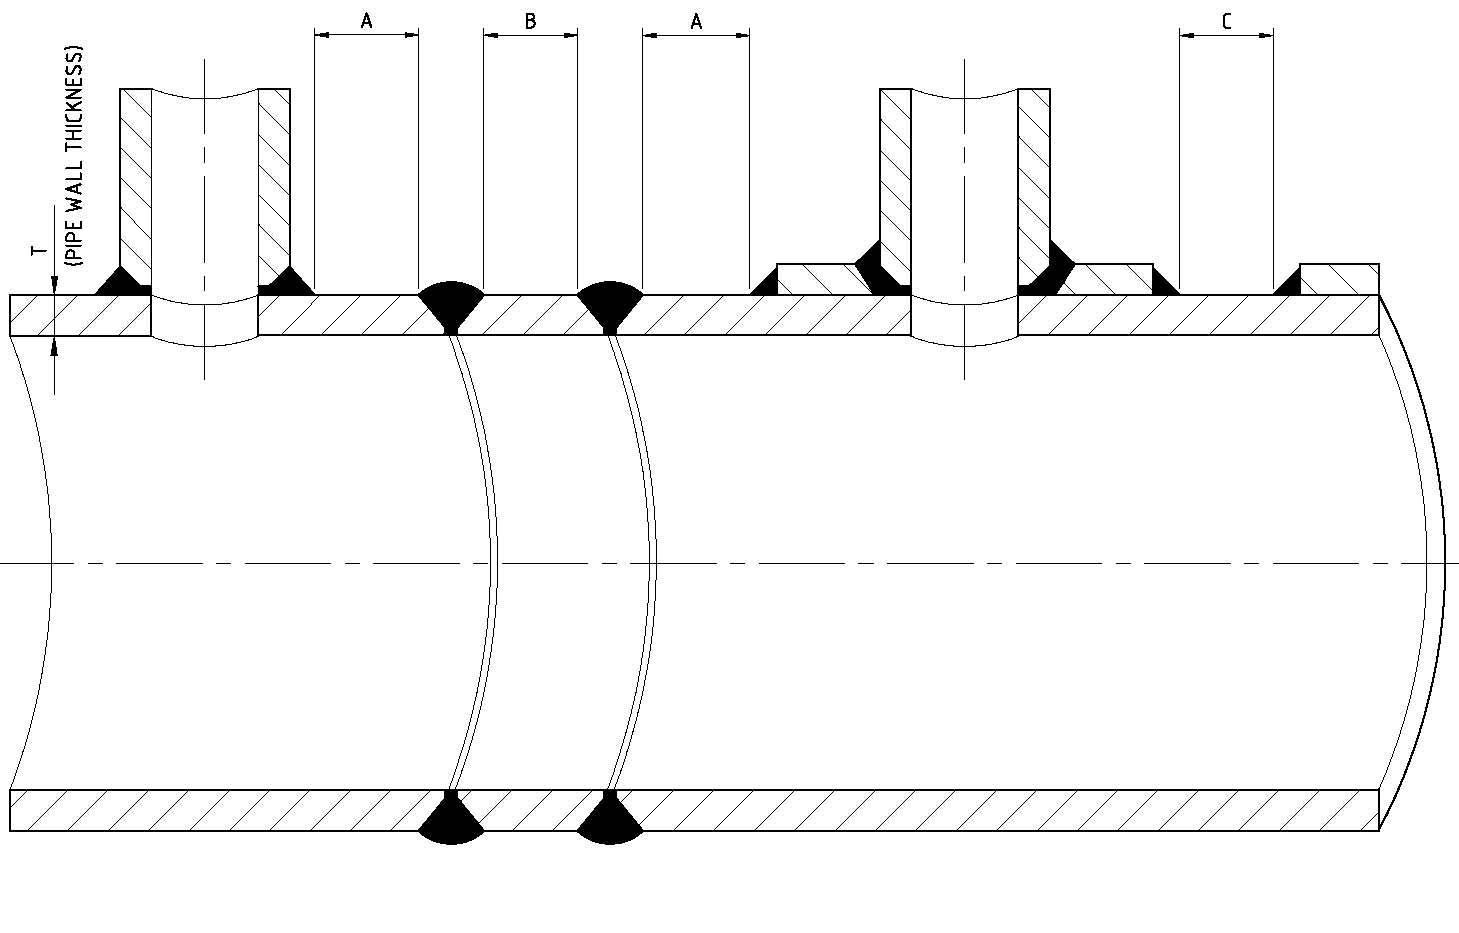 Piping Info Minimum Gap Between Weldings Thumb Rule Welding Joint Diagram Distance Welds